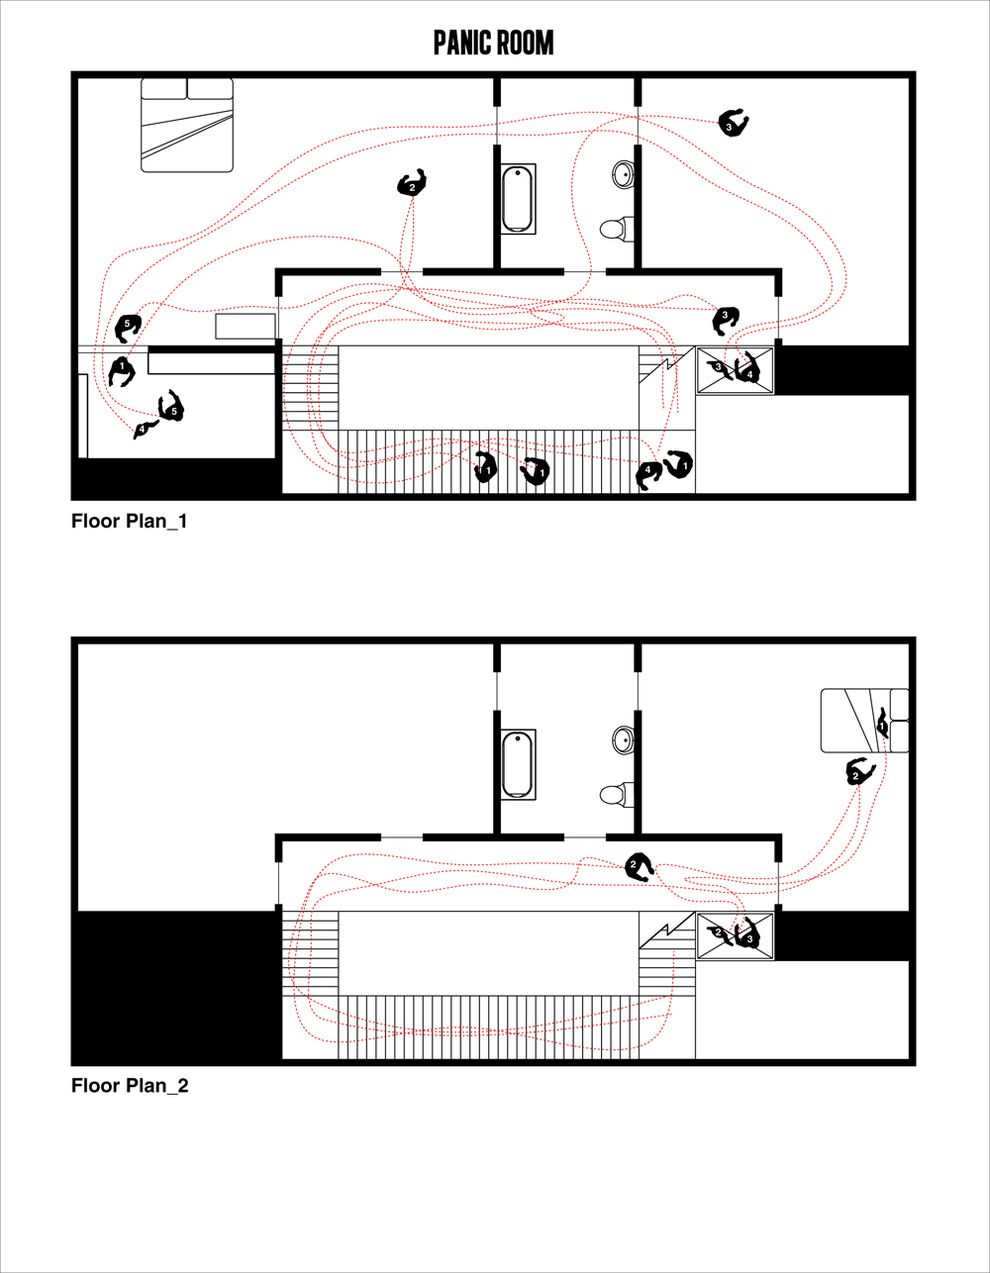 9 Floor Plans Of Popular Movie Scenes O Quarto Do Panico Floor Plan Arquitetura